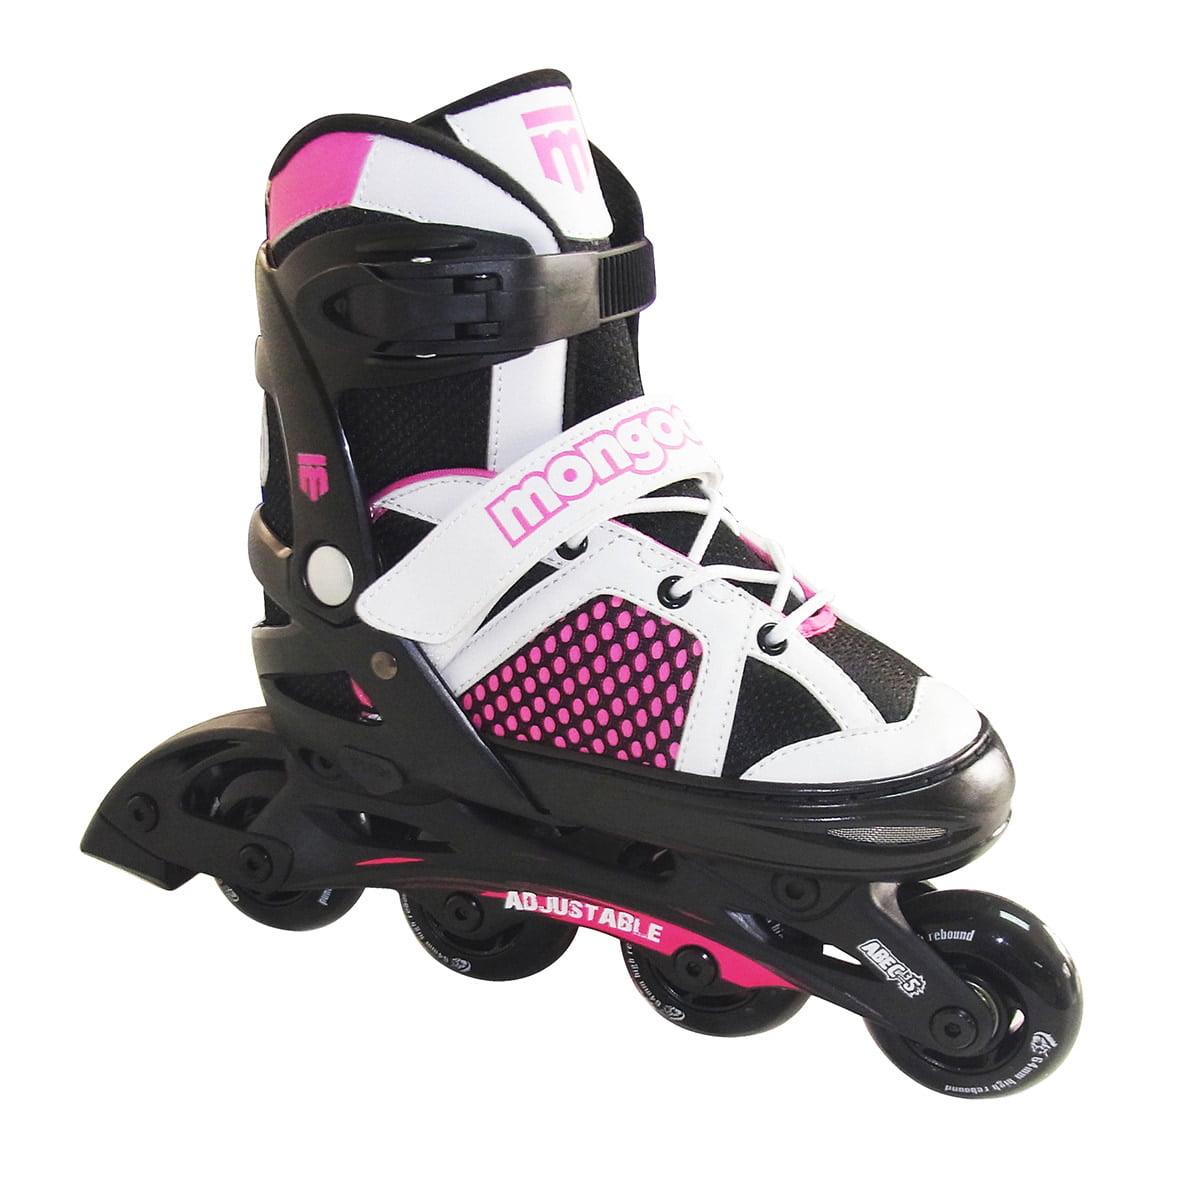 Pop out roller skate shoes - Pop Out Roller Skate Shoes 53